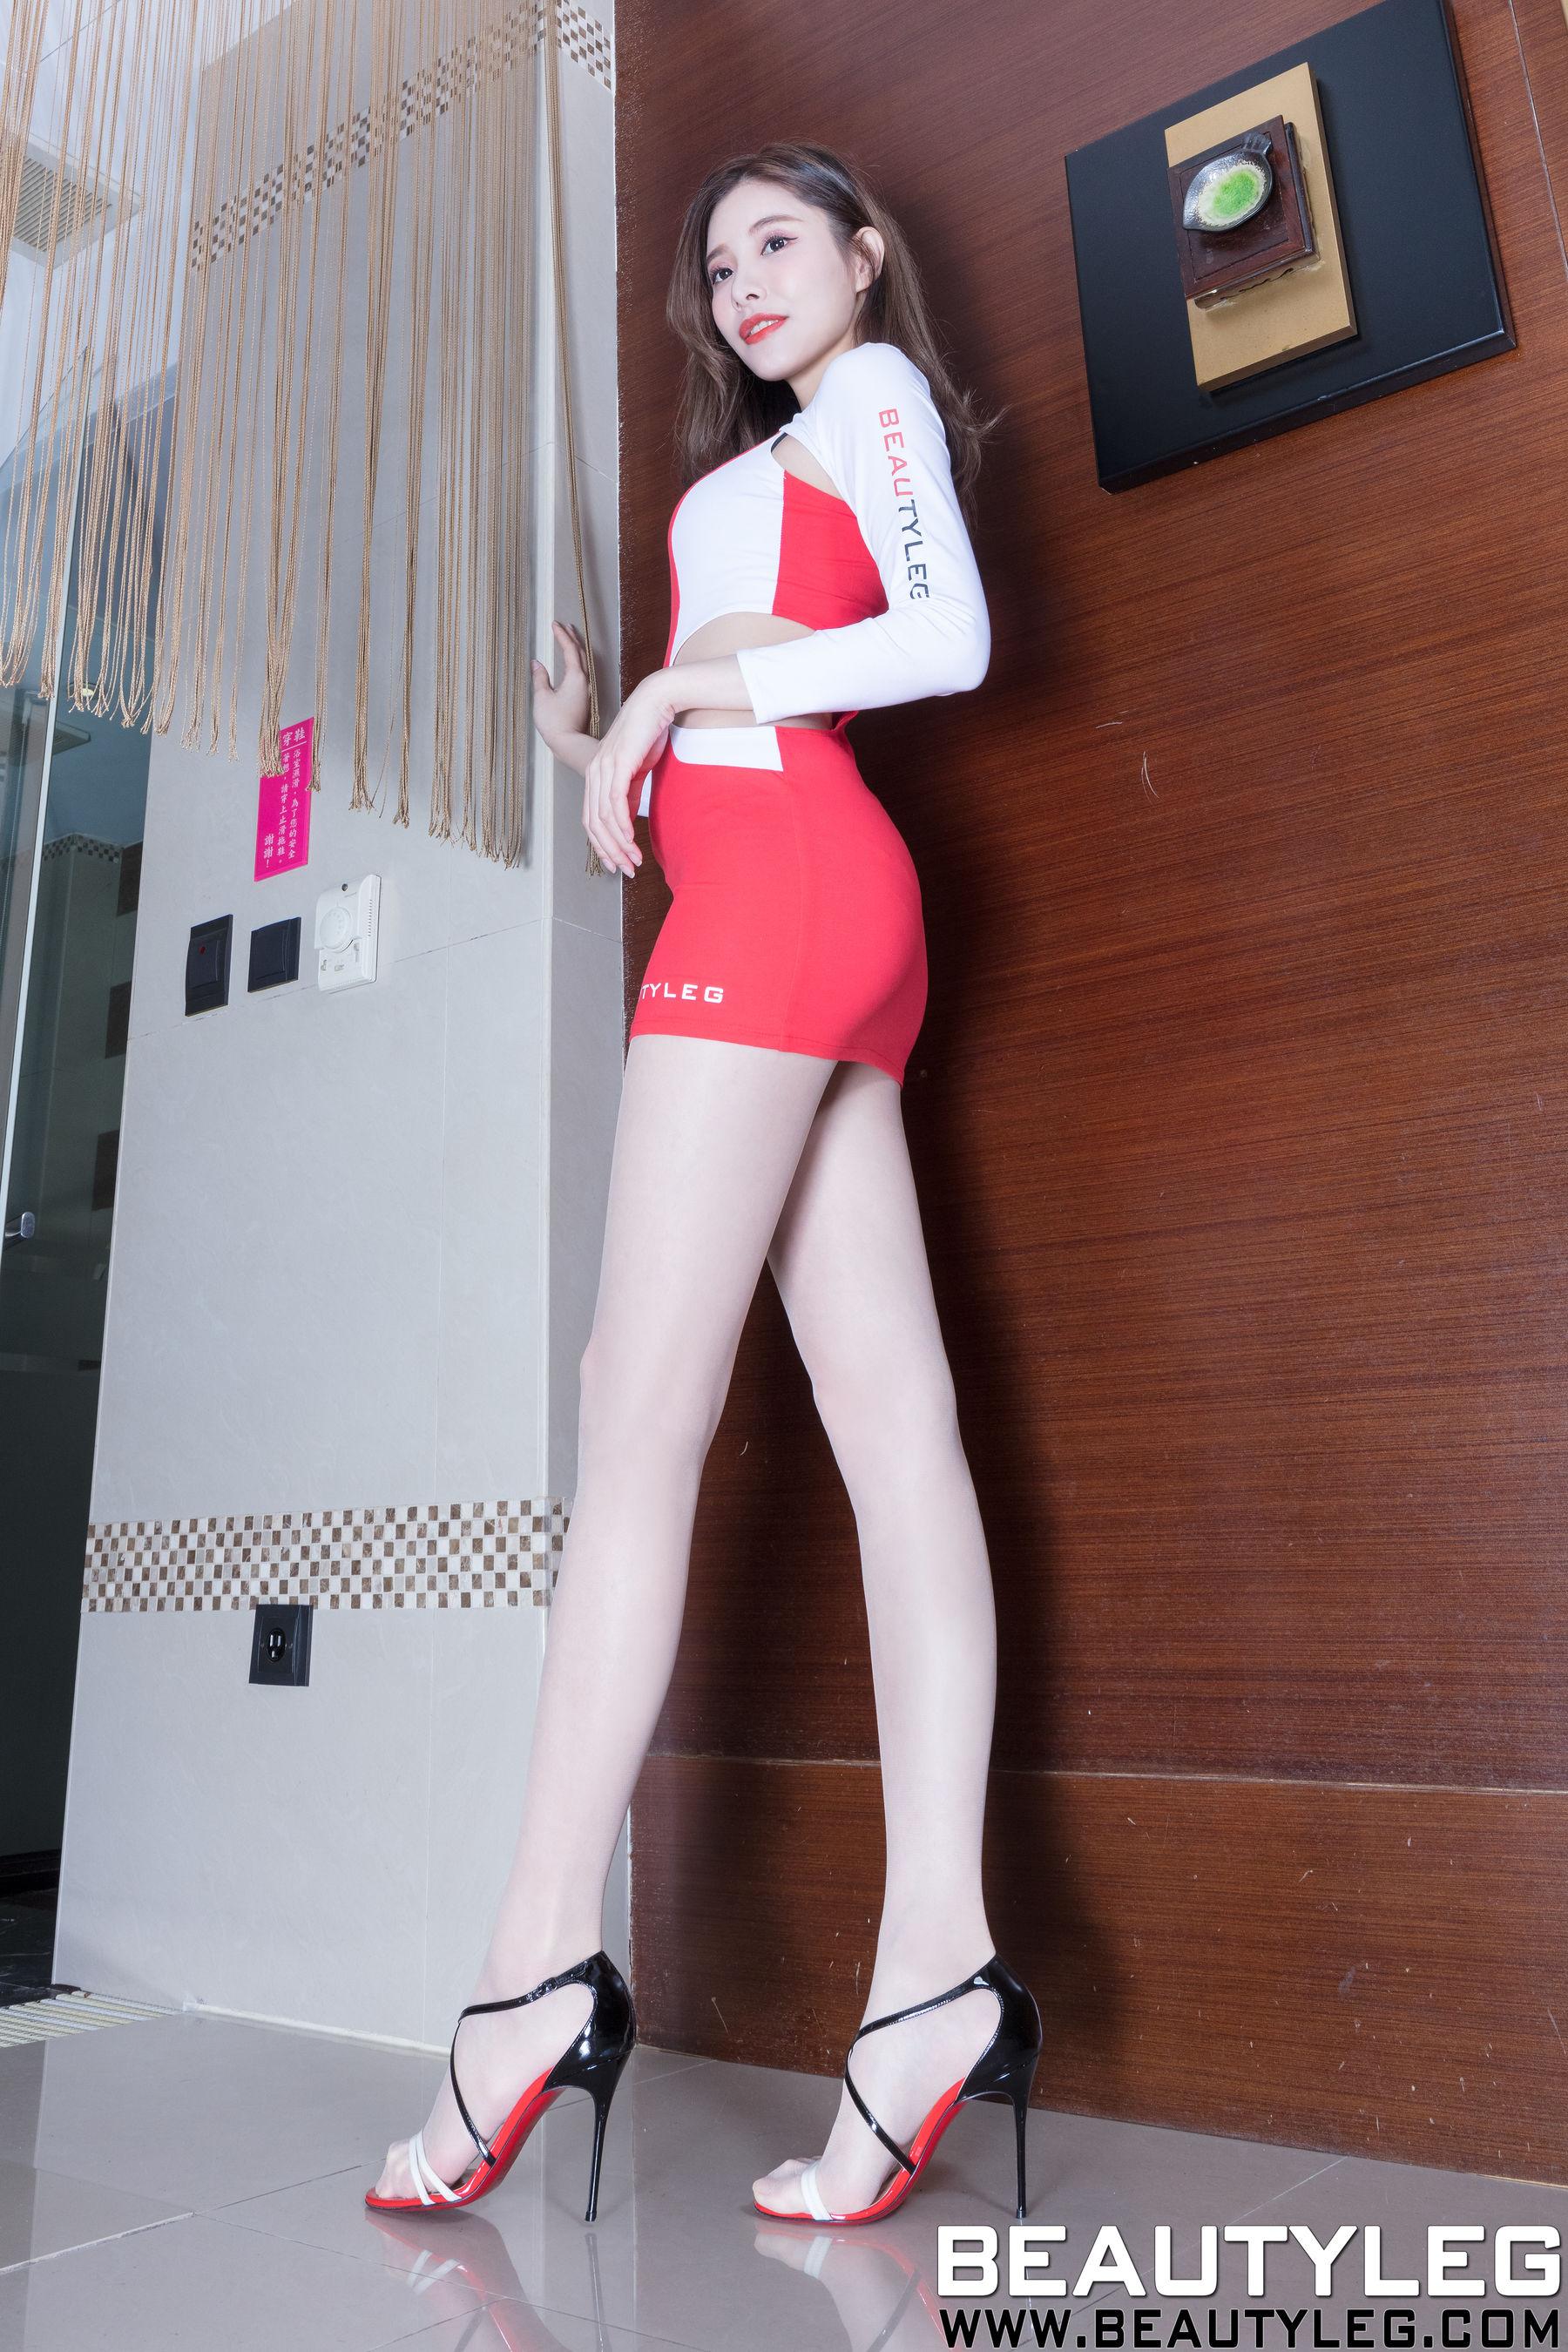 VOL.1452 [Beautyleg]制服高跟美腿:陈玉雪(腿模Abby)超高清个人性感漂亮大图(42P)